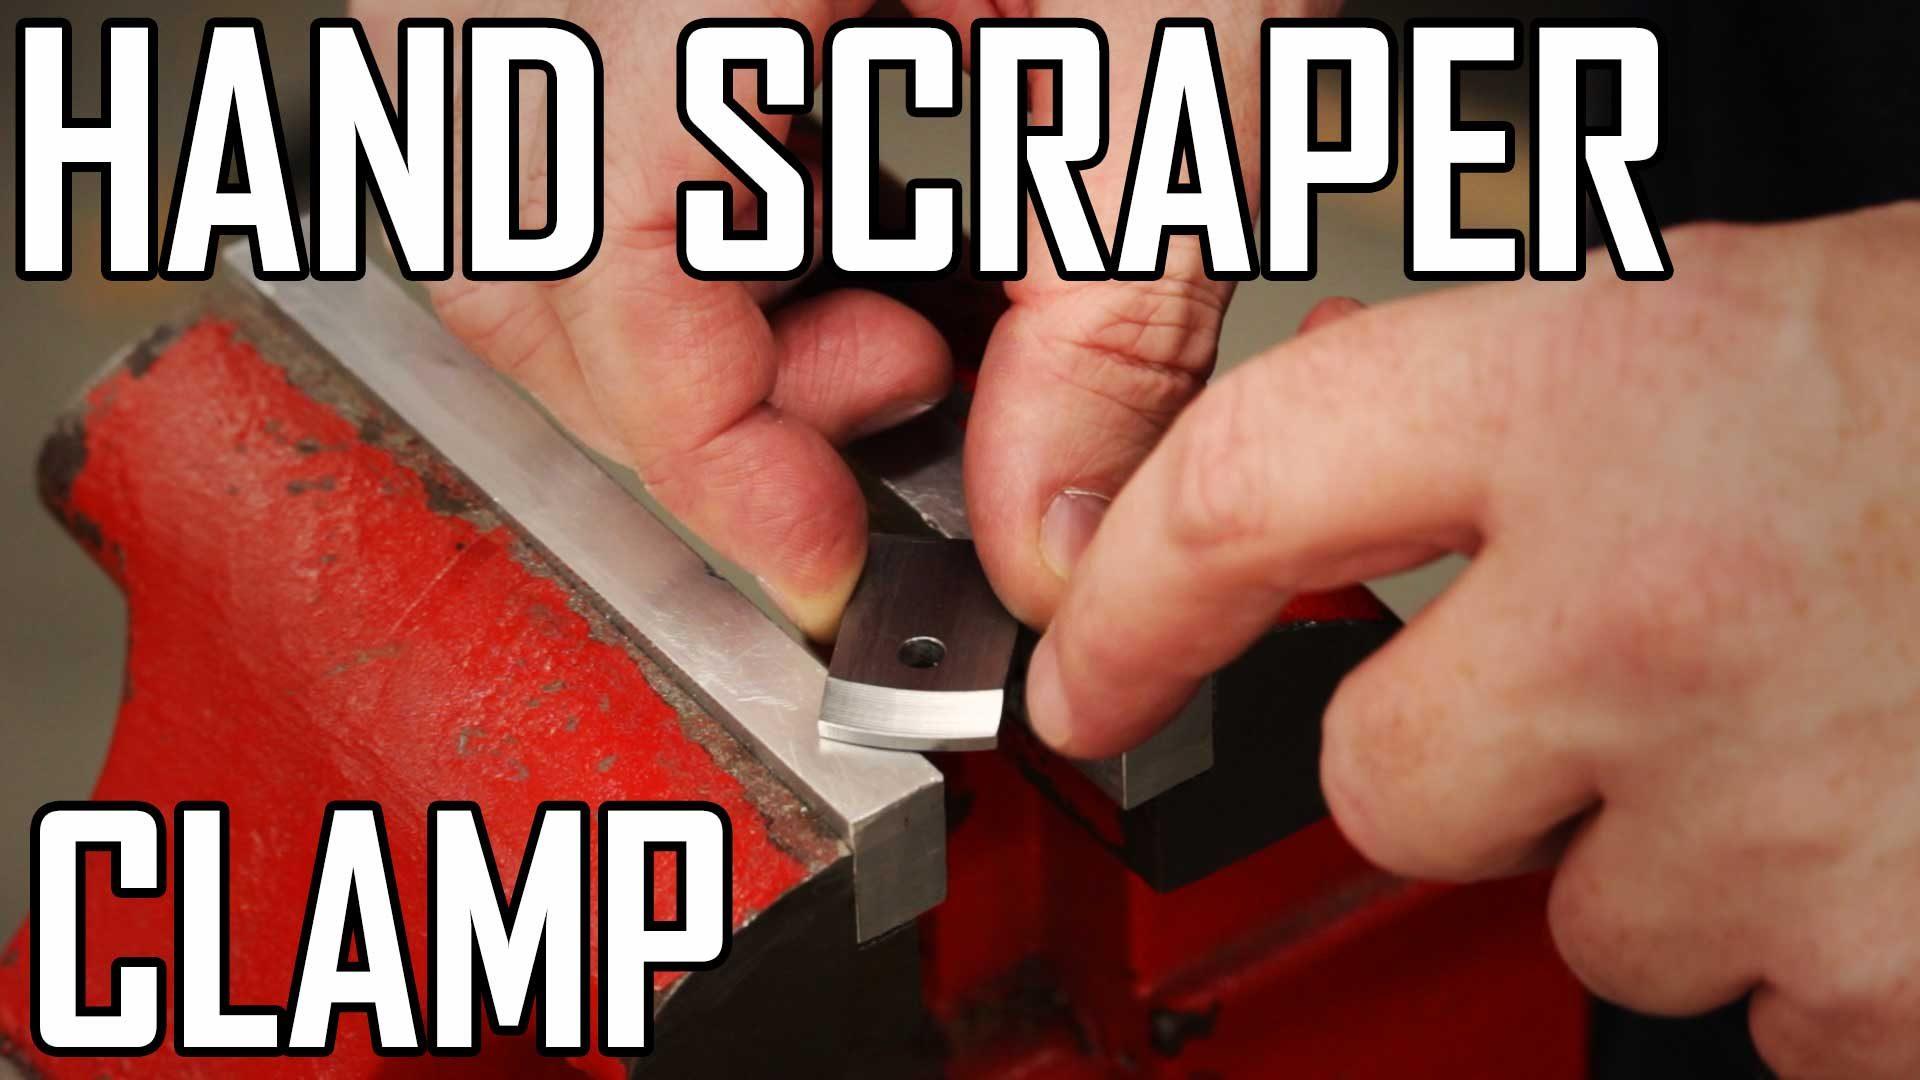 Hand Scraper 4: Machining the Clamp